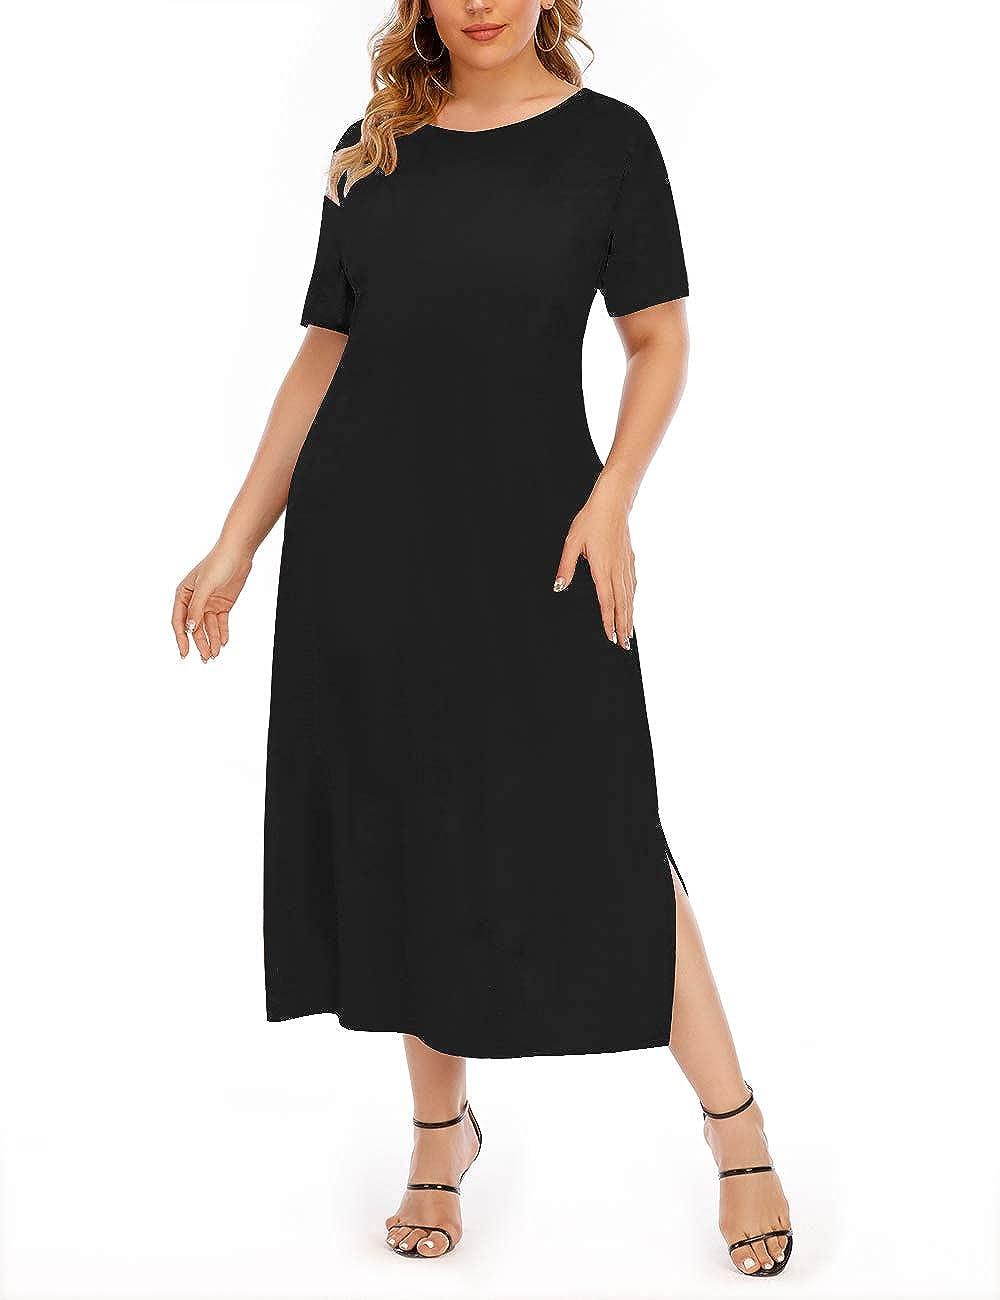 Aksbgg Women's Casual Short Sleeve Long Dress Floral Leopard Print Plus Size Maxi Tie Dye Dresses 1X-4X